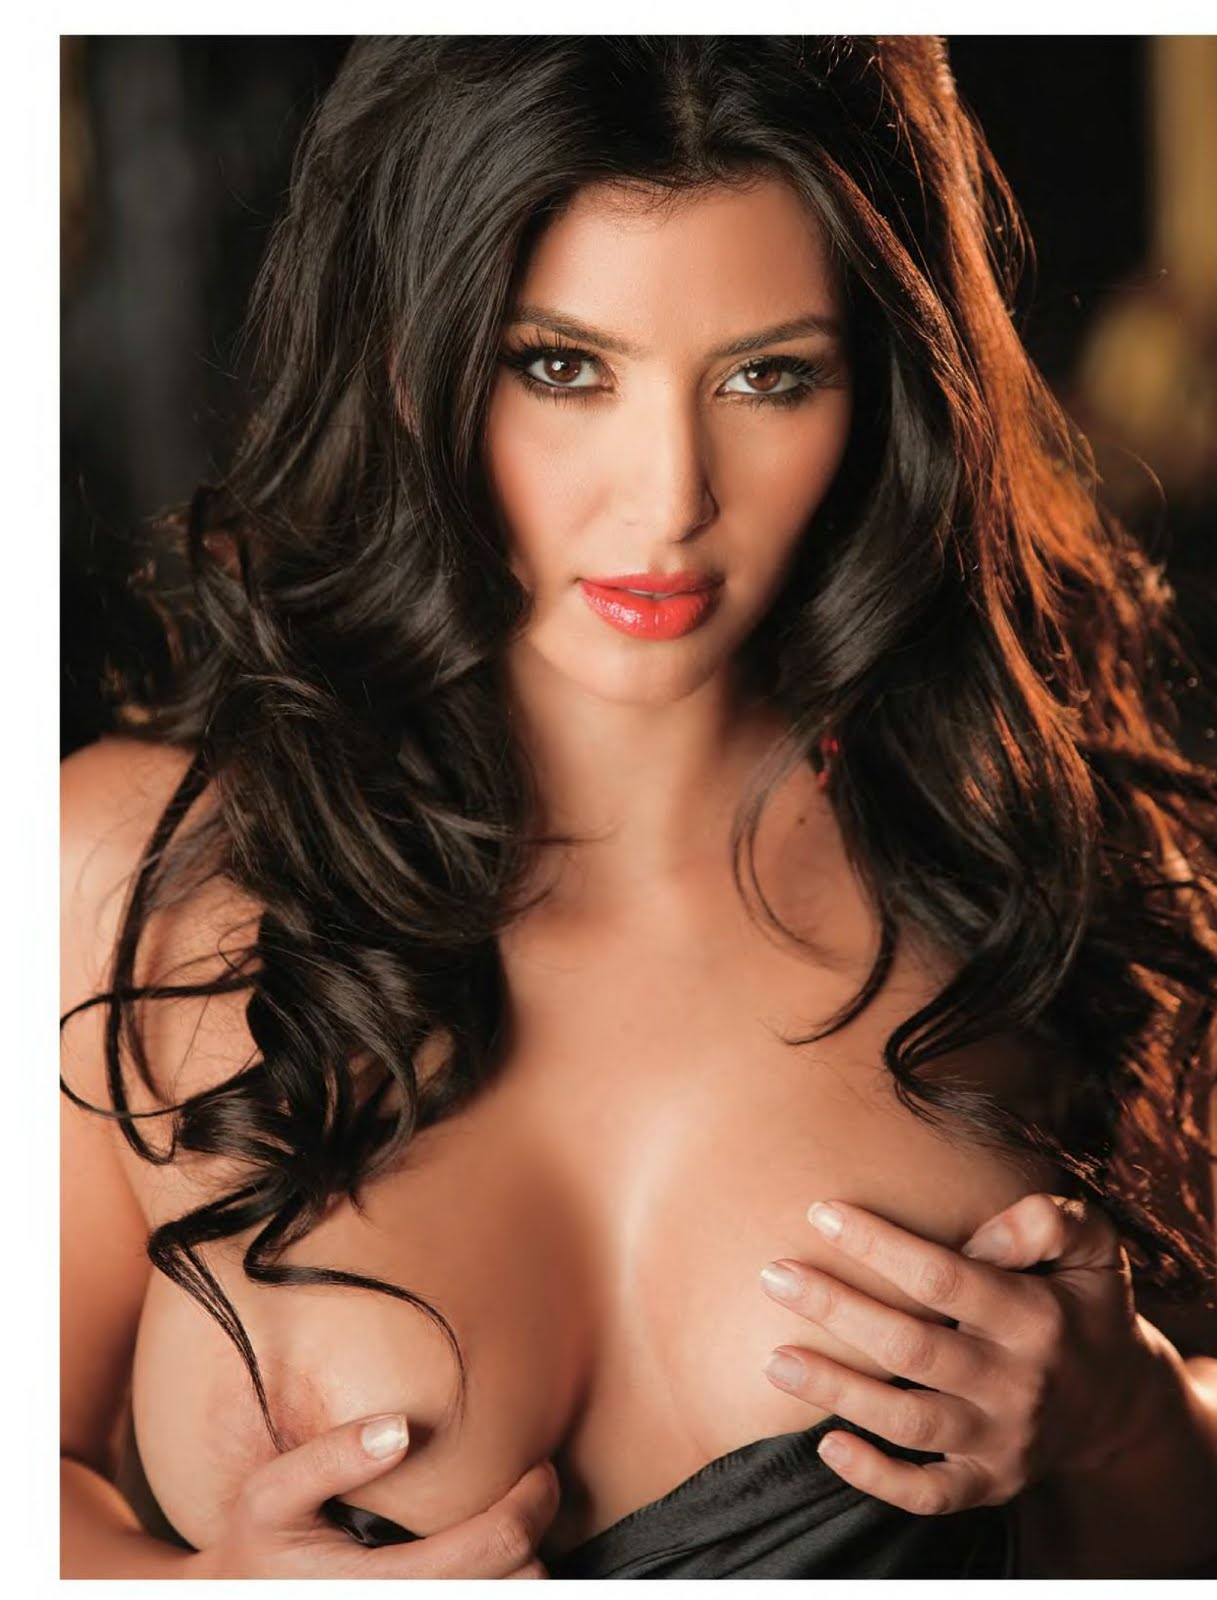 Devils Kim Kardashian Playboy-8540